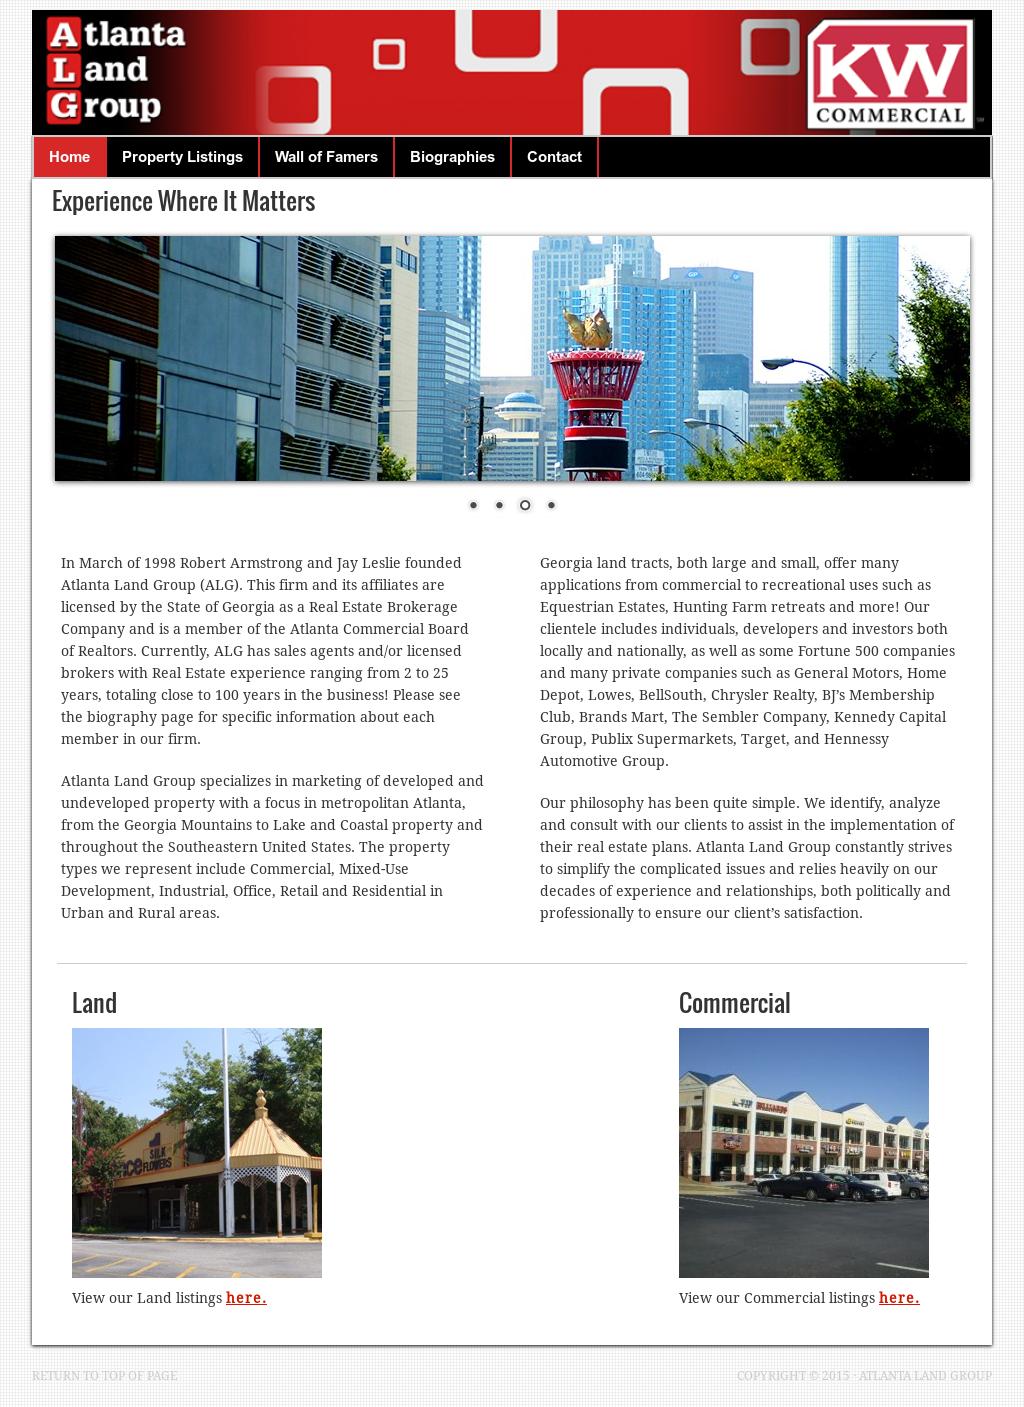 Atlantalandgroup Competitors, Revenue and Employees - Owler Company ...